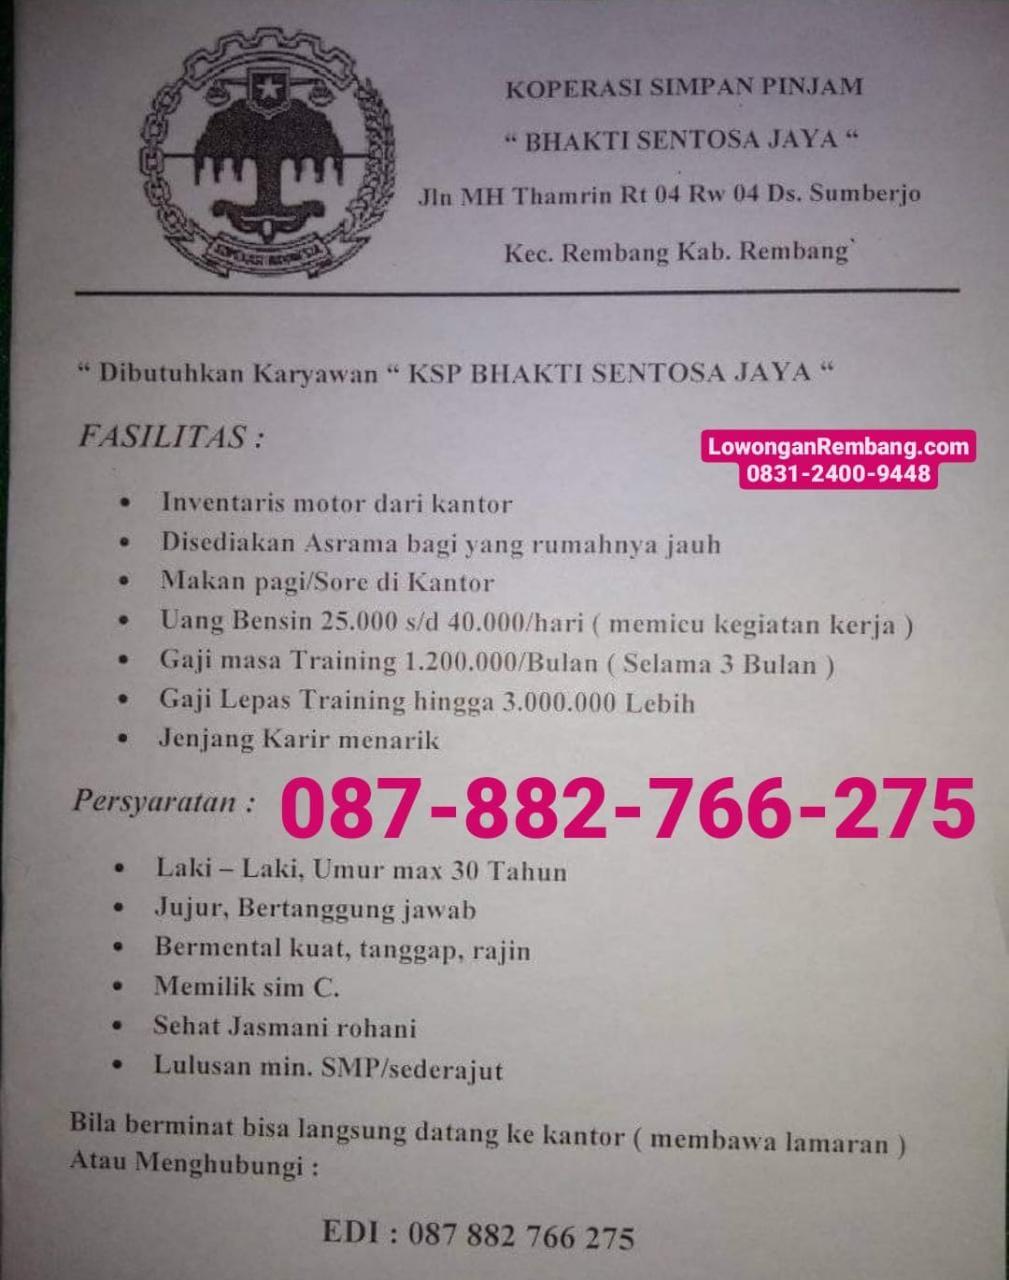 Lowongan Kerja Karyawan KSP Bhakti Sentosa Jaya Pendidikan Minimal SMP Sederajat